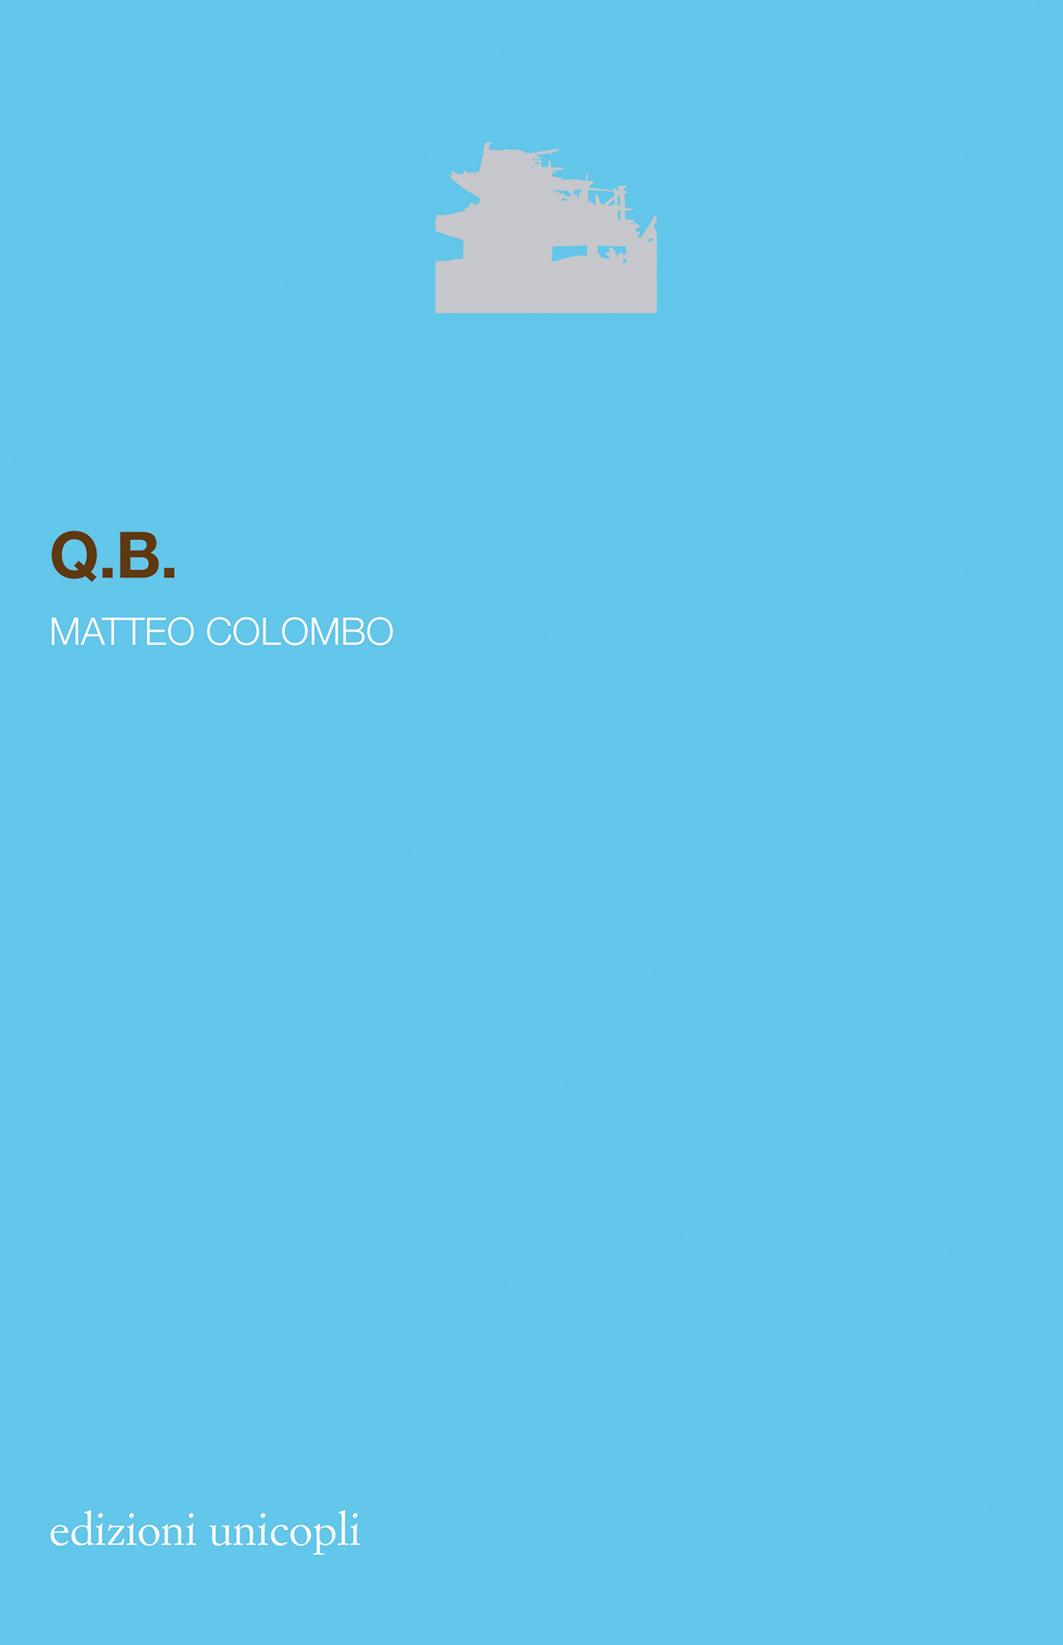 q.b. copertina